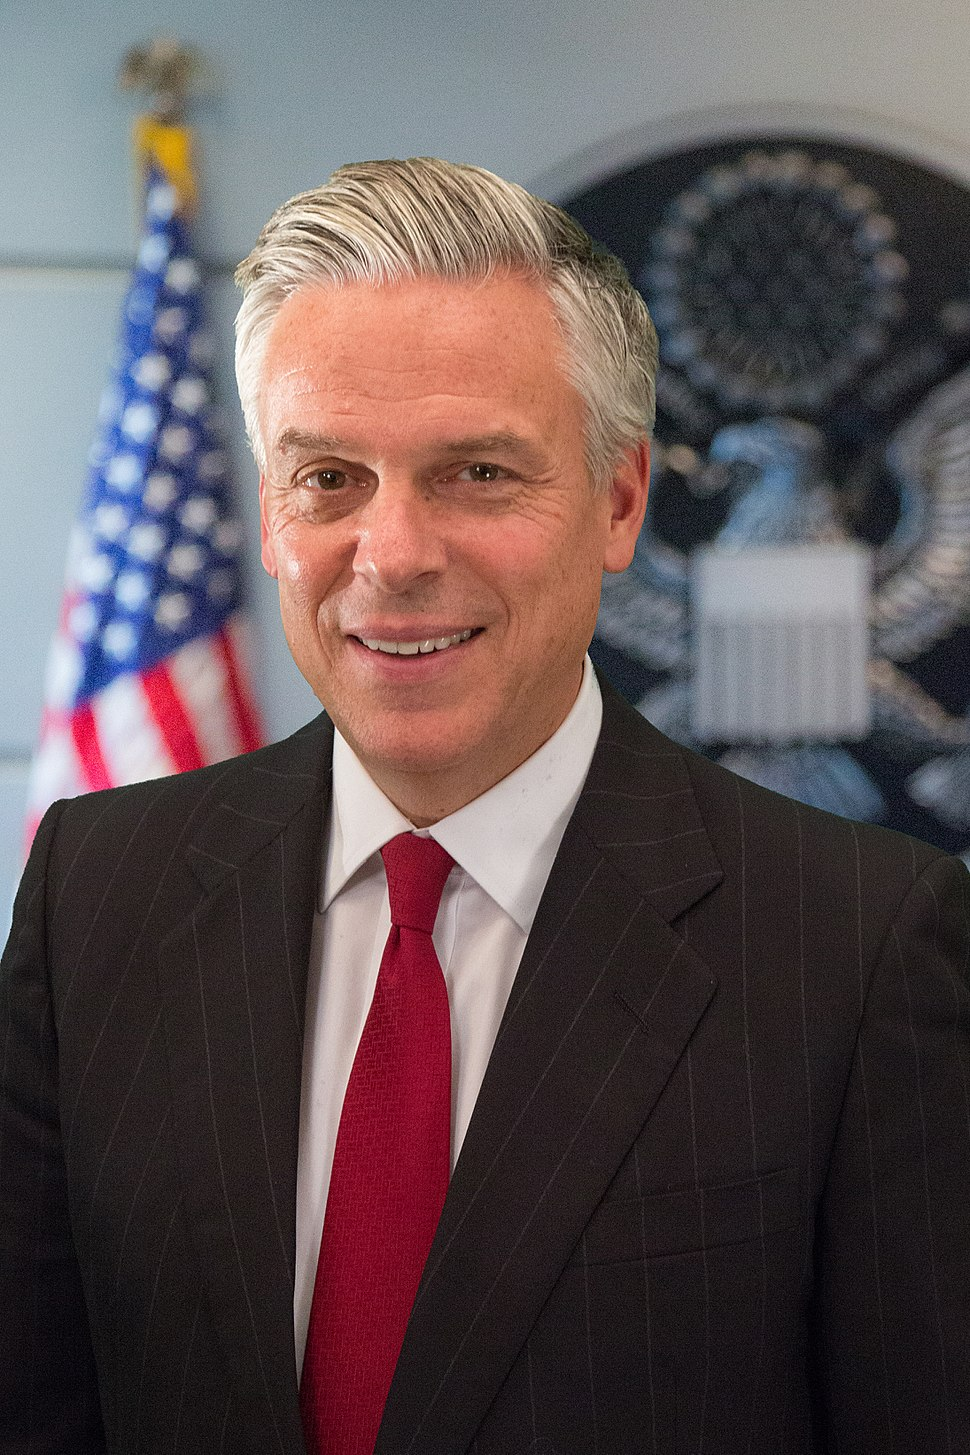 Ambassador Jon M. Huntsman Jr